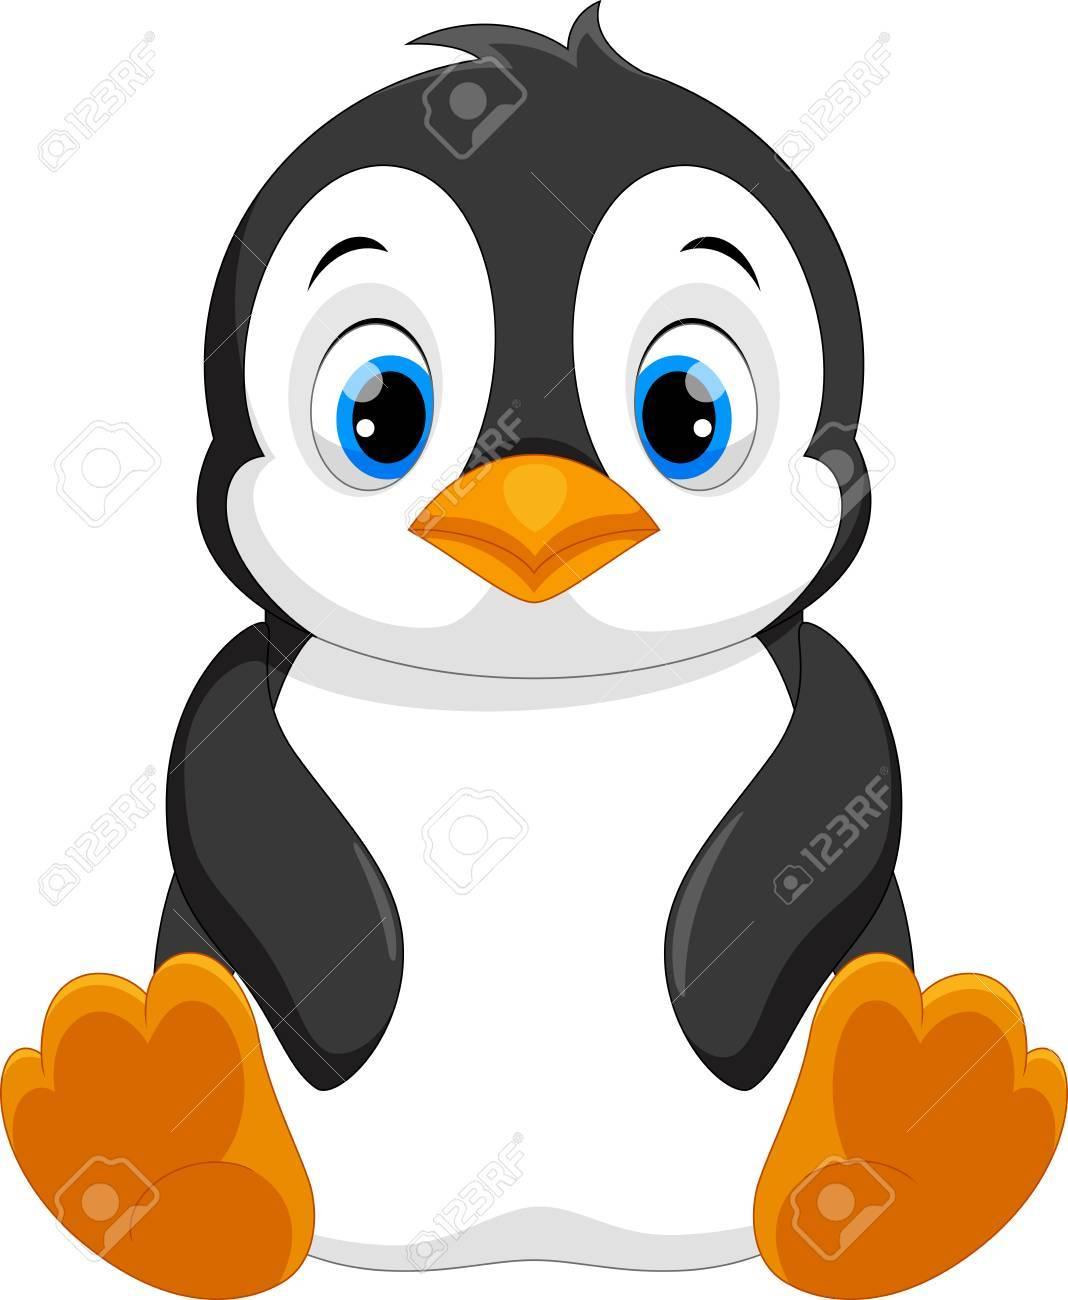 Penguin pictures clipart image transparent stock Cute baby penguin clipart 7 » Clipart Portal image transparent stock